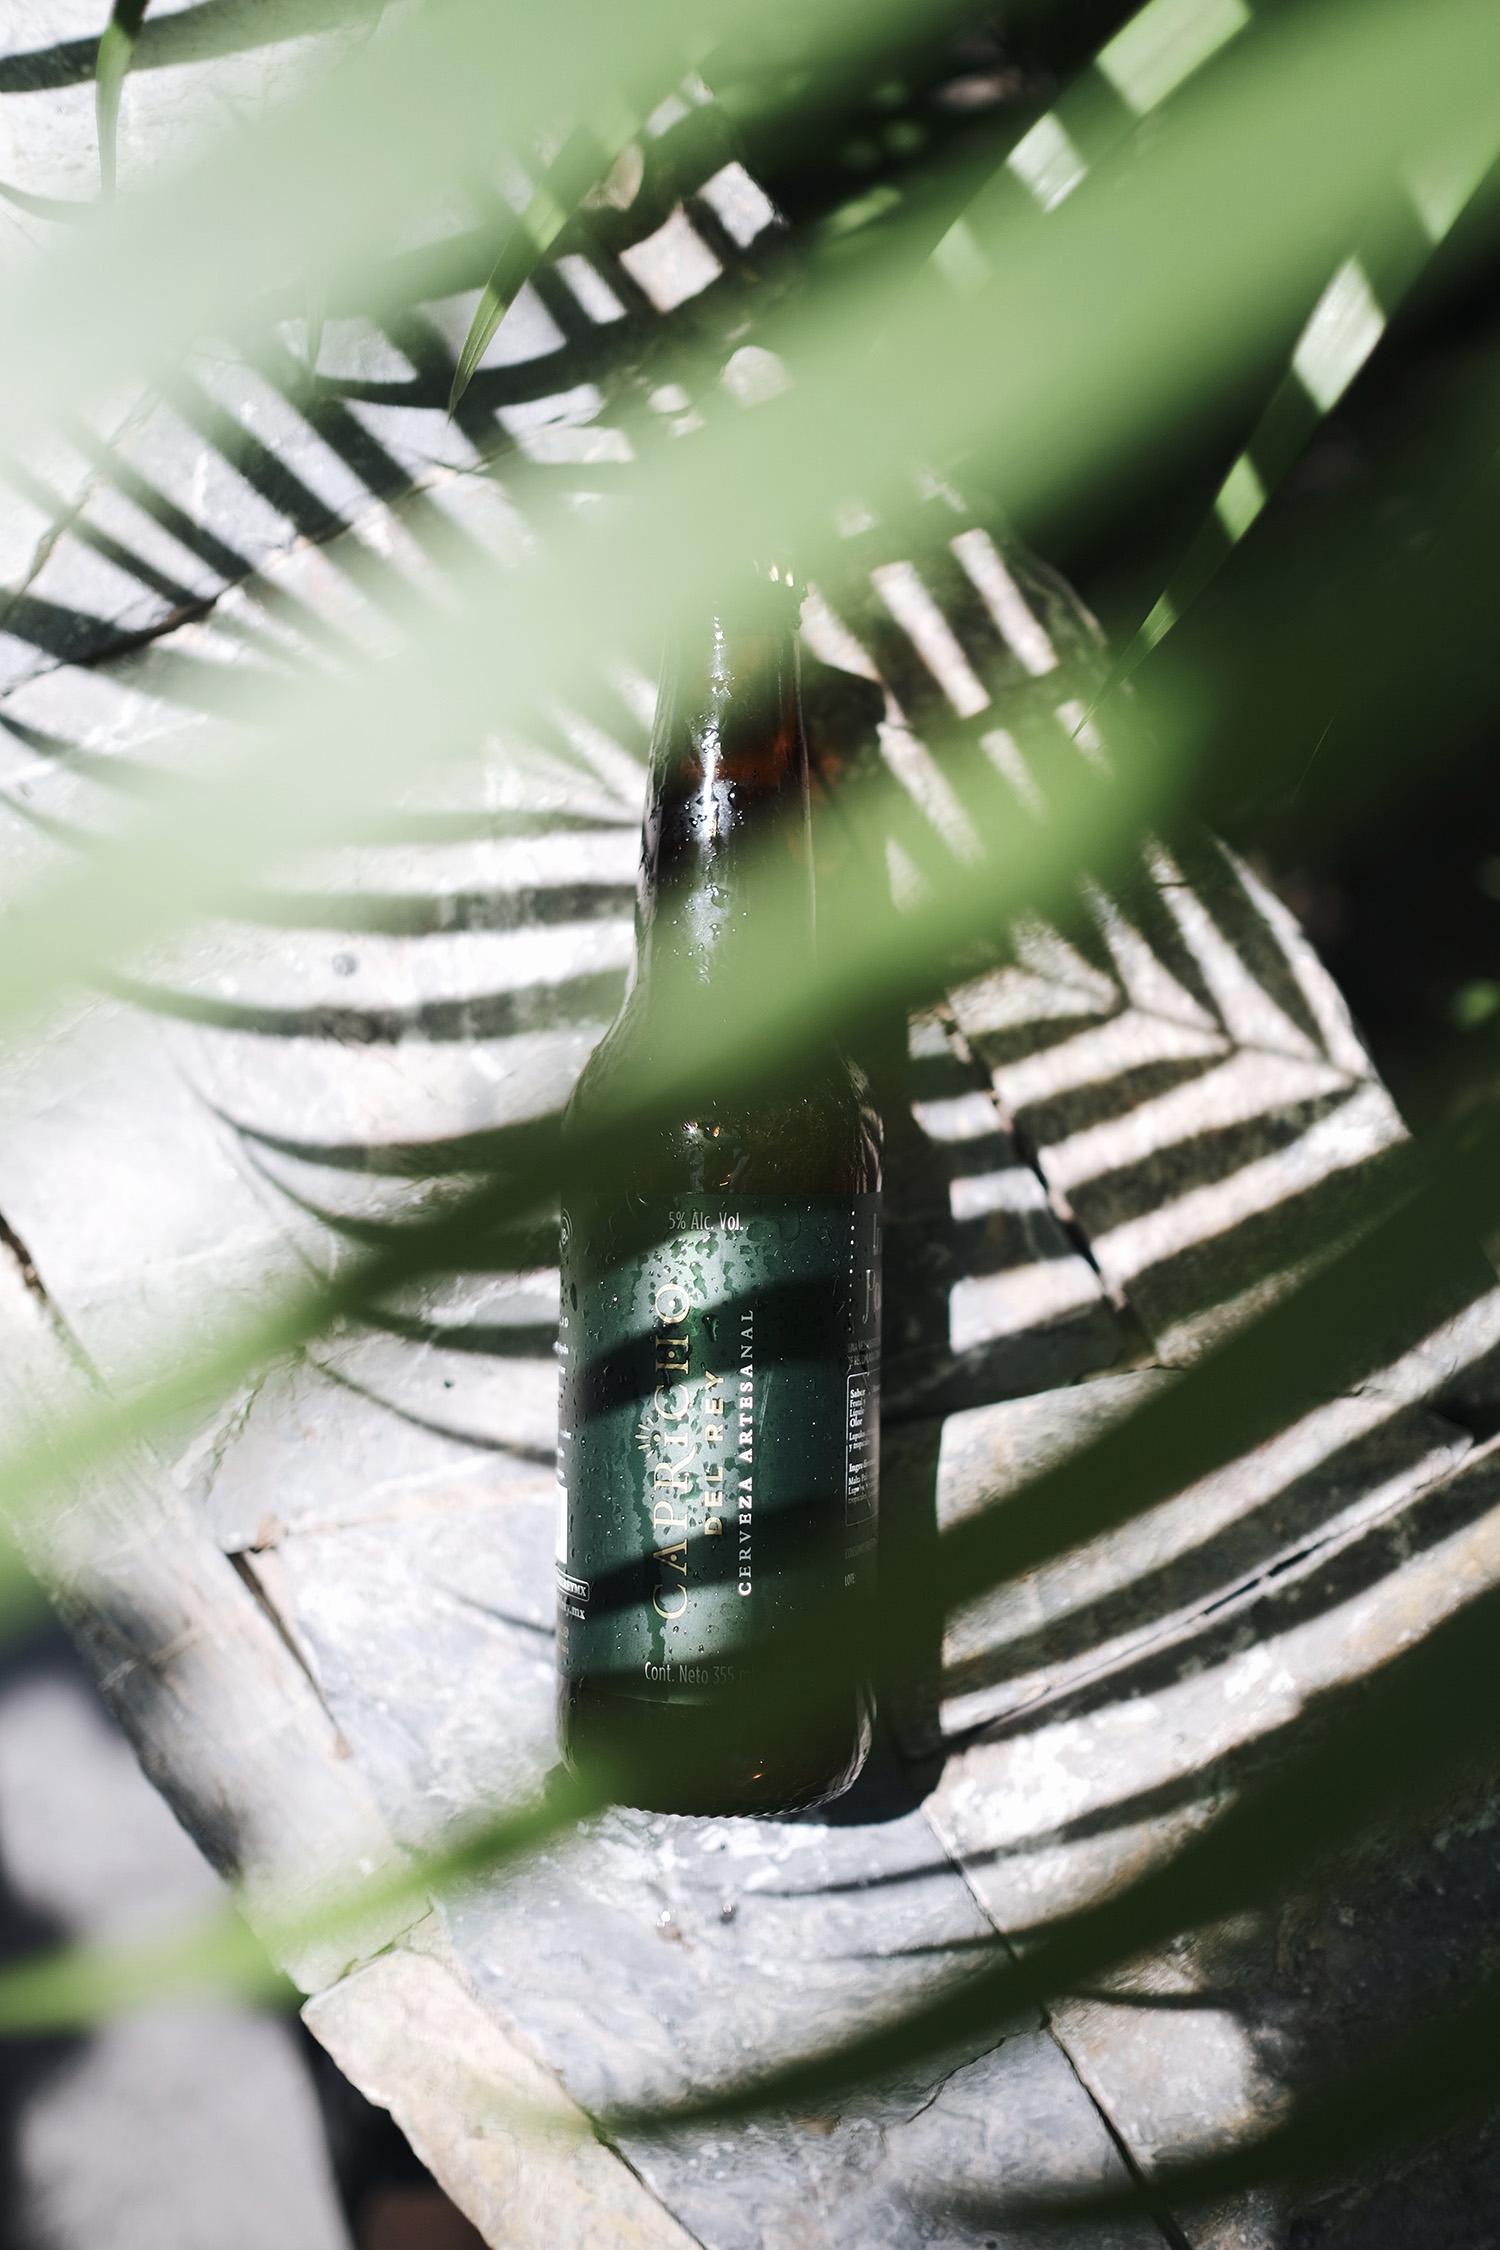 Capricho-Del-Rey-Cerveza-Ixtapa-Zihuatanejo-Fotografia-Heiko-Bothe-2.jpg